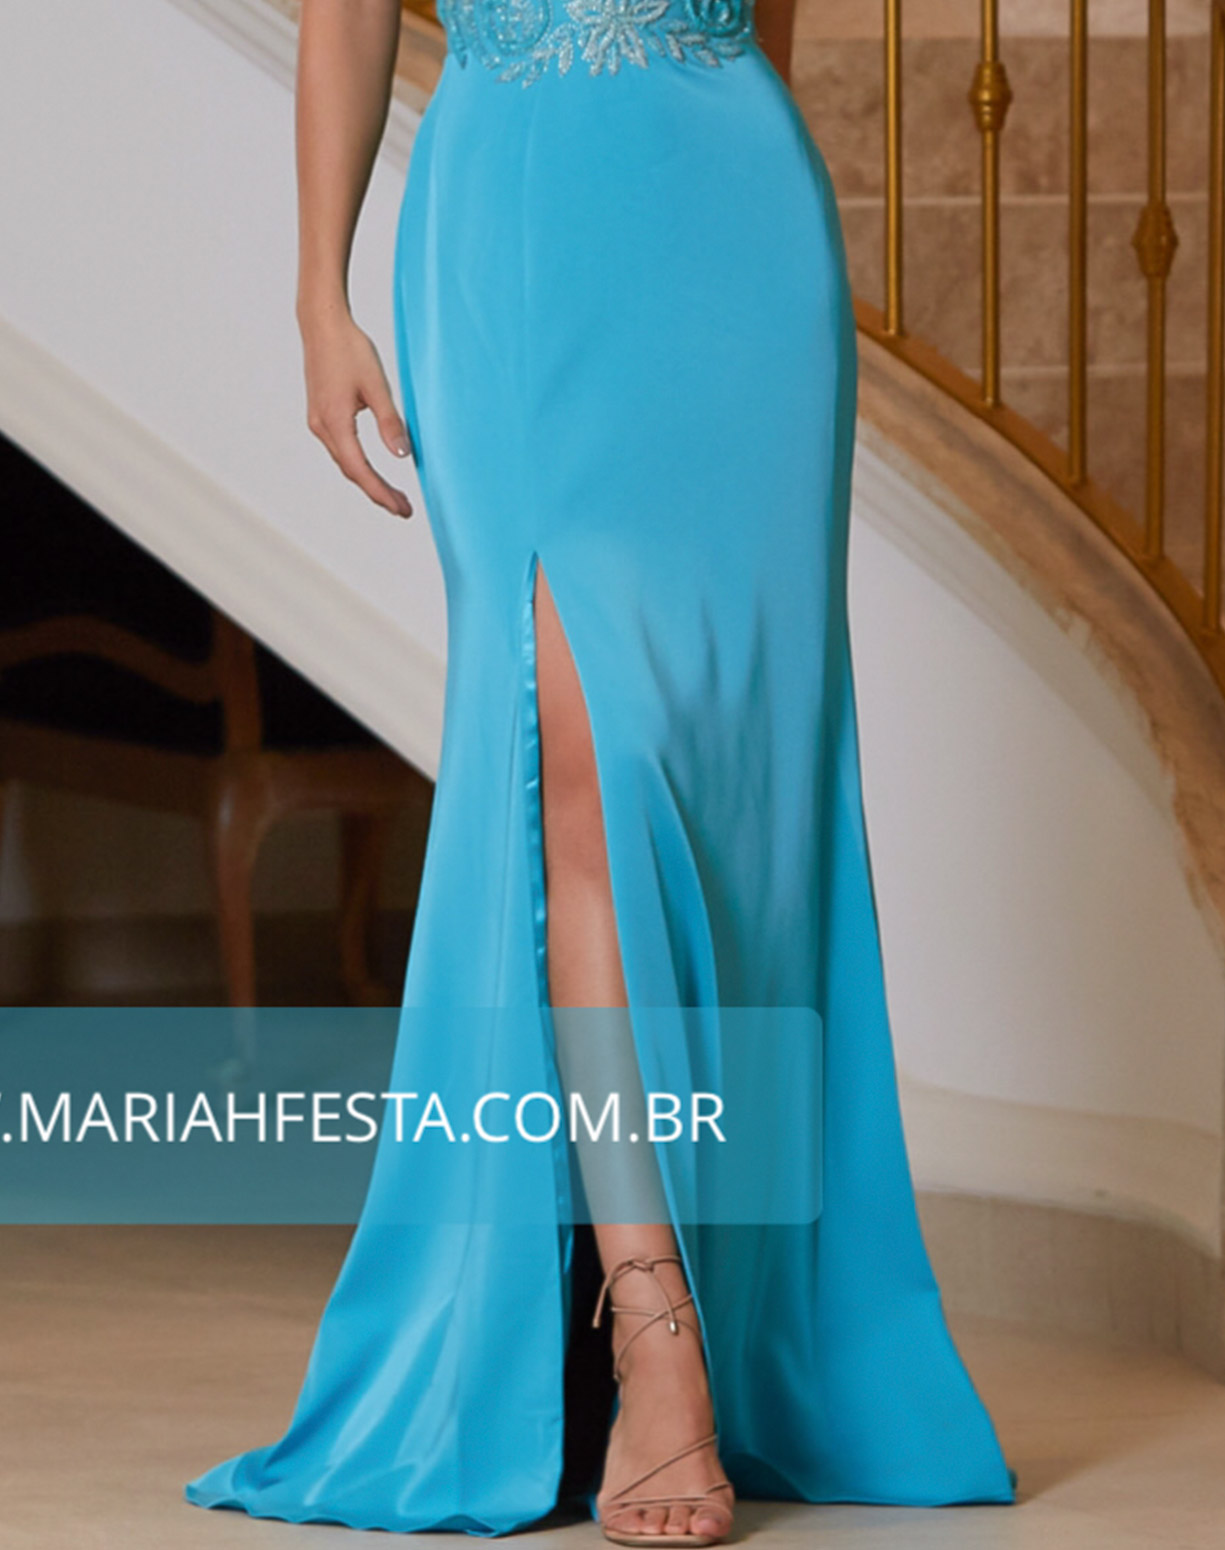 Vestido Tiffany Sereia com Bordado no Corpo